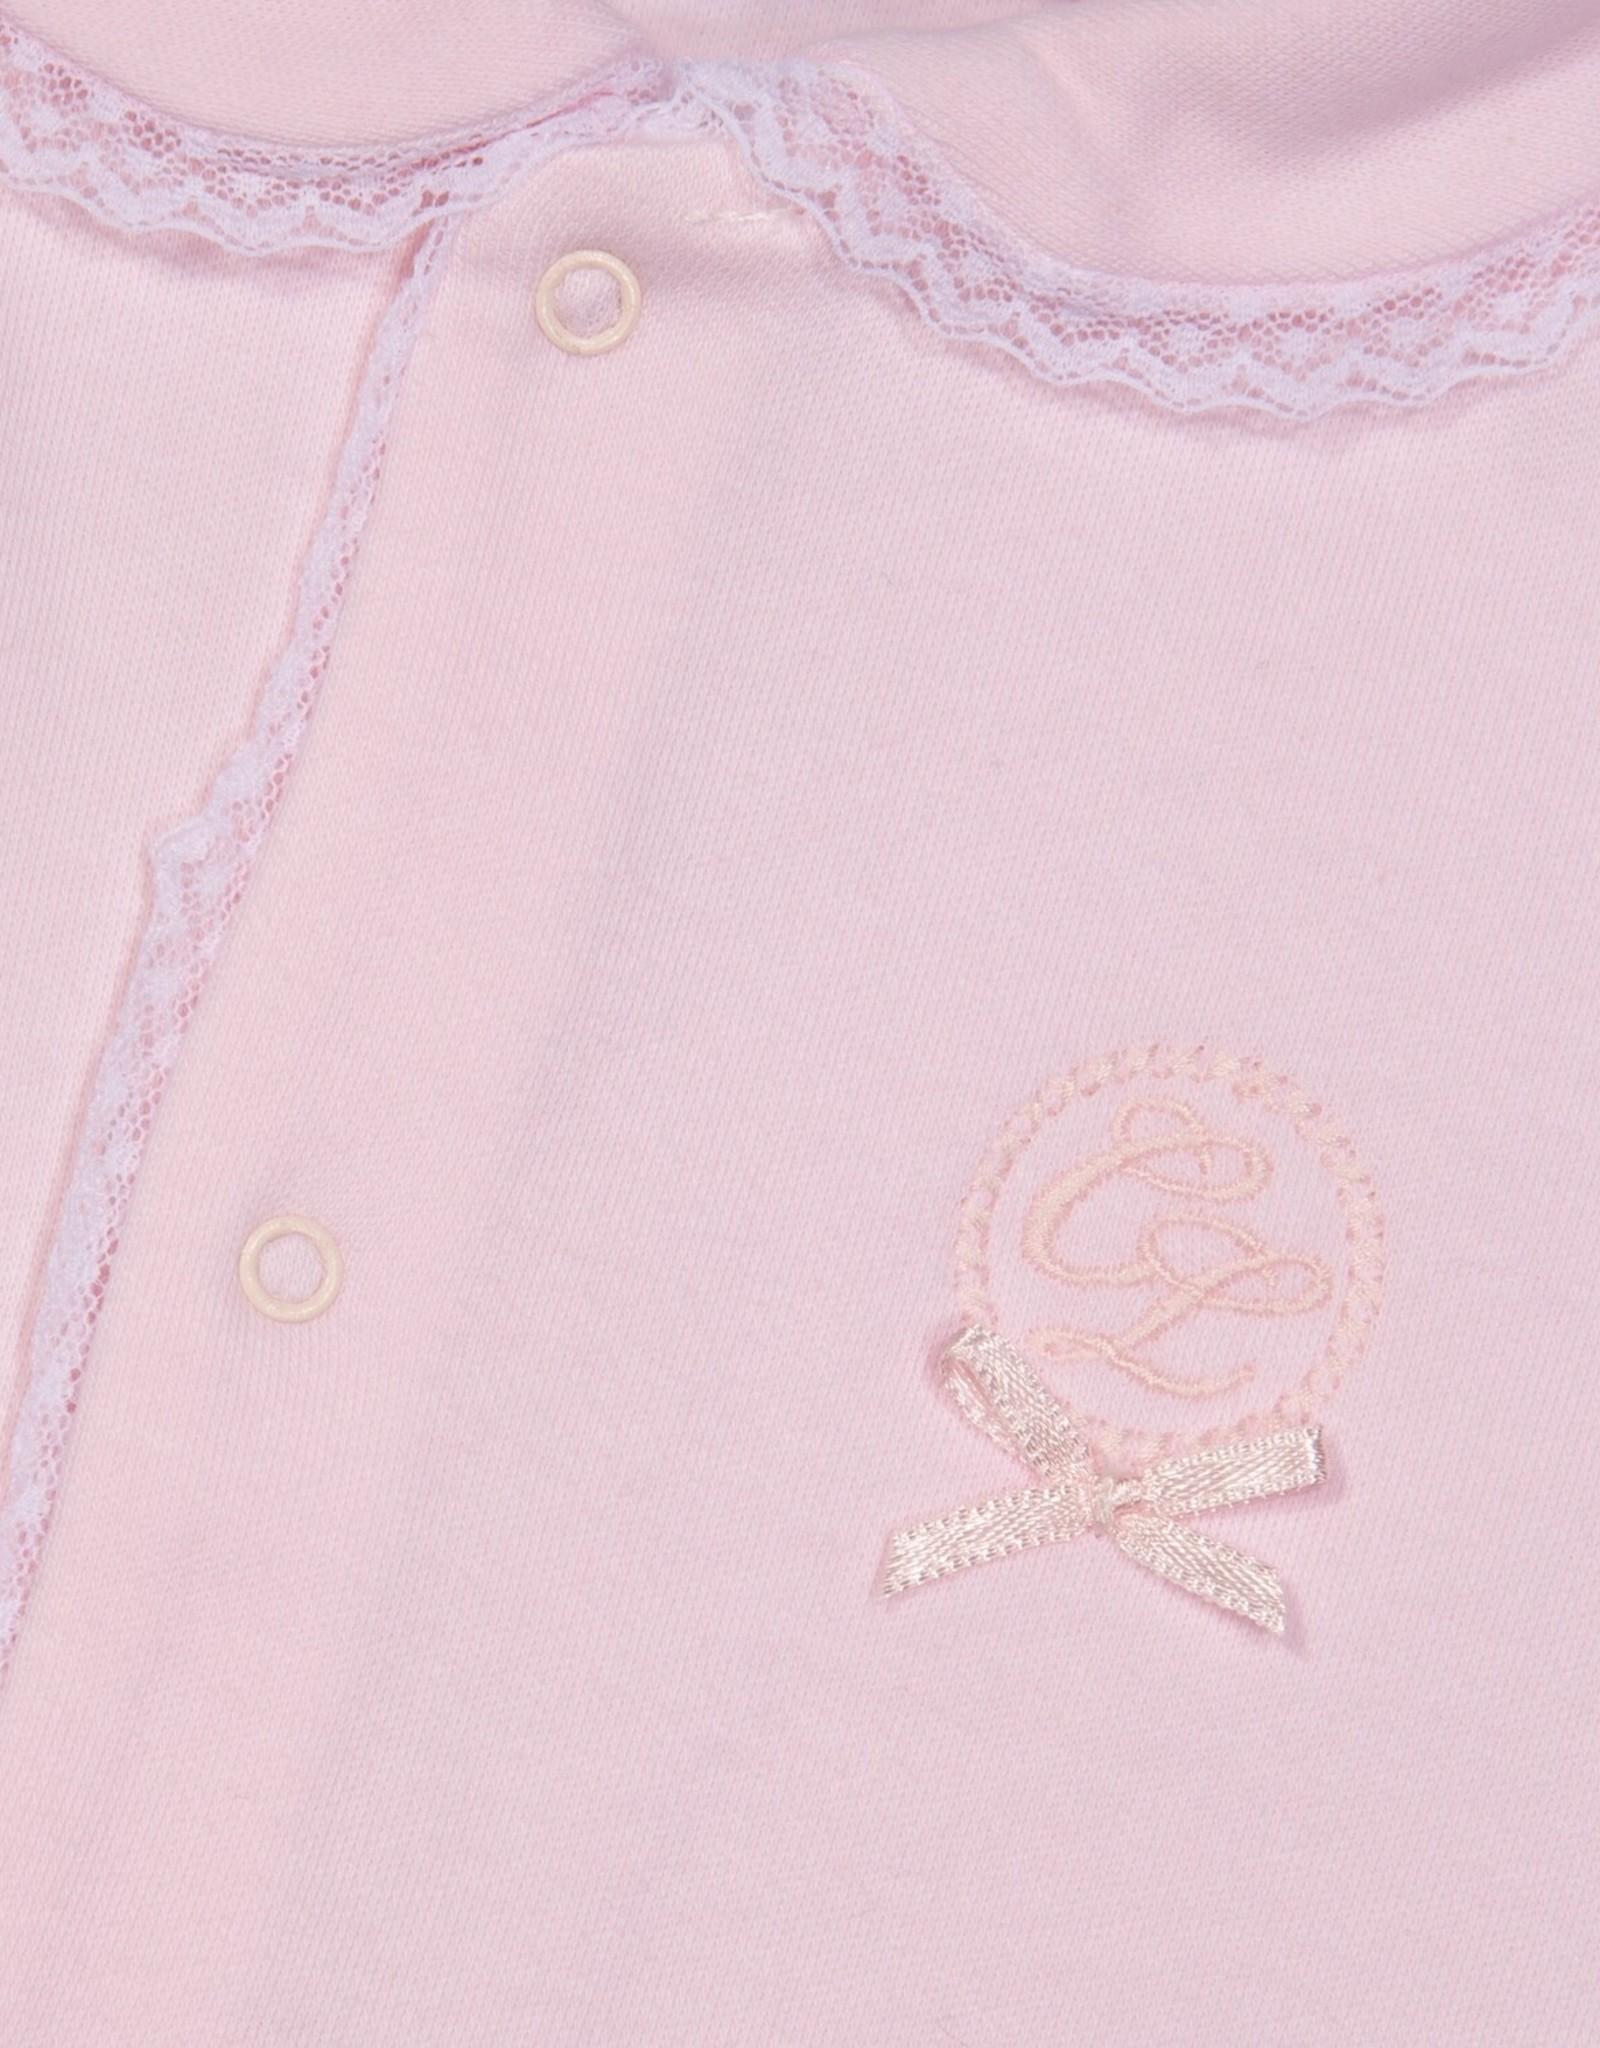 COTOLINI COTOLINI Eléonore rose+ dentelle